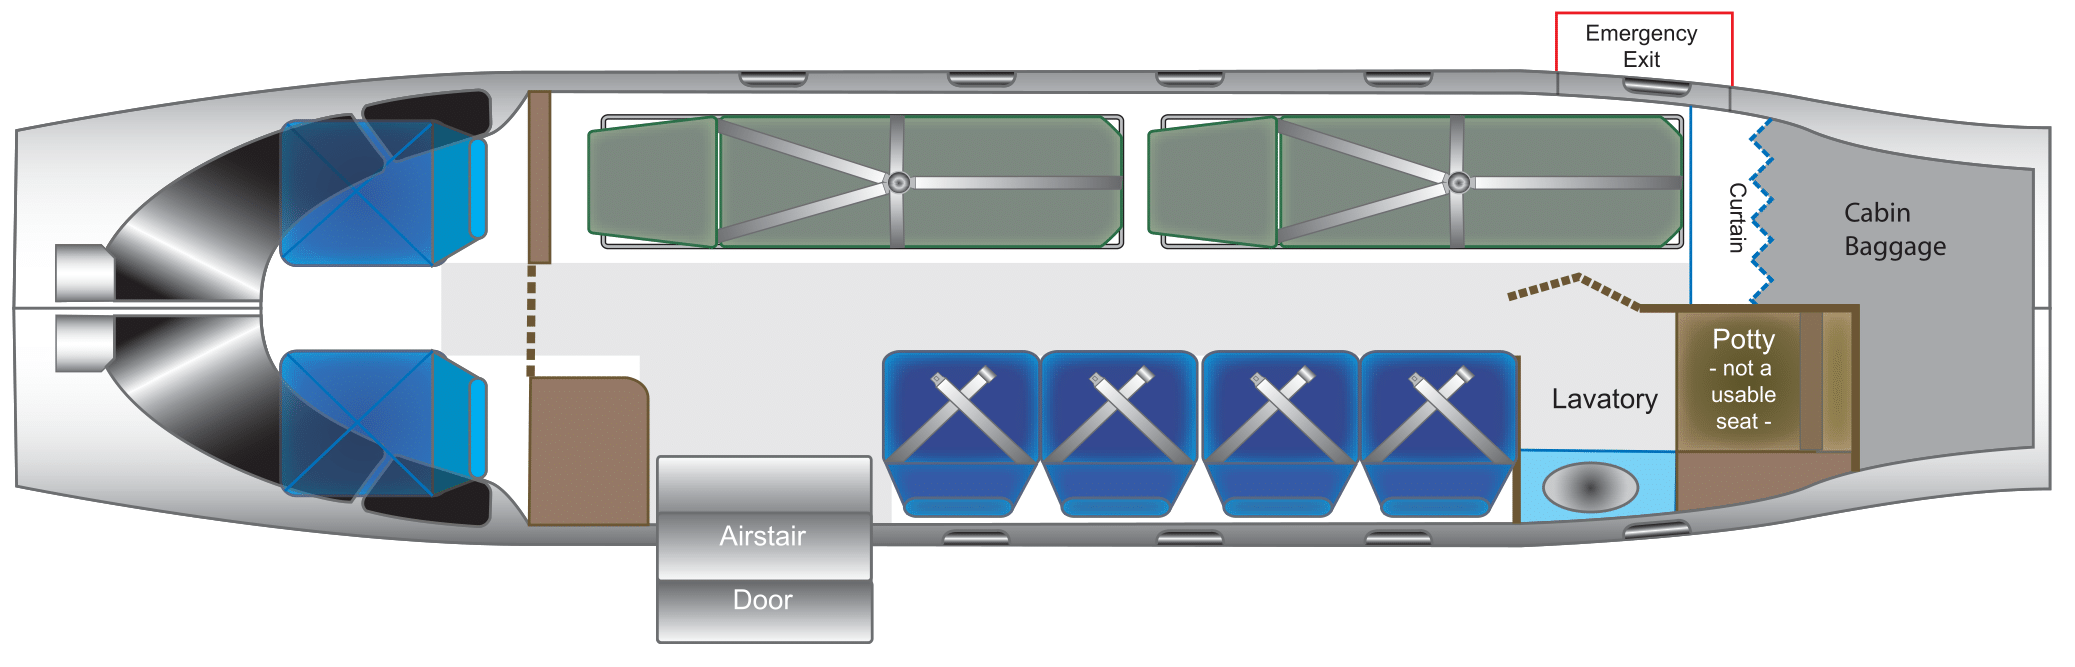 LR55 Interior JEI_AMB4-1.png